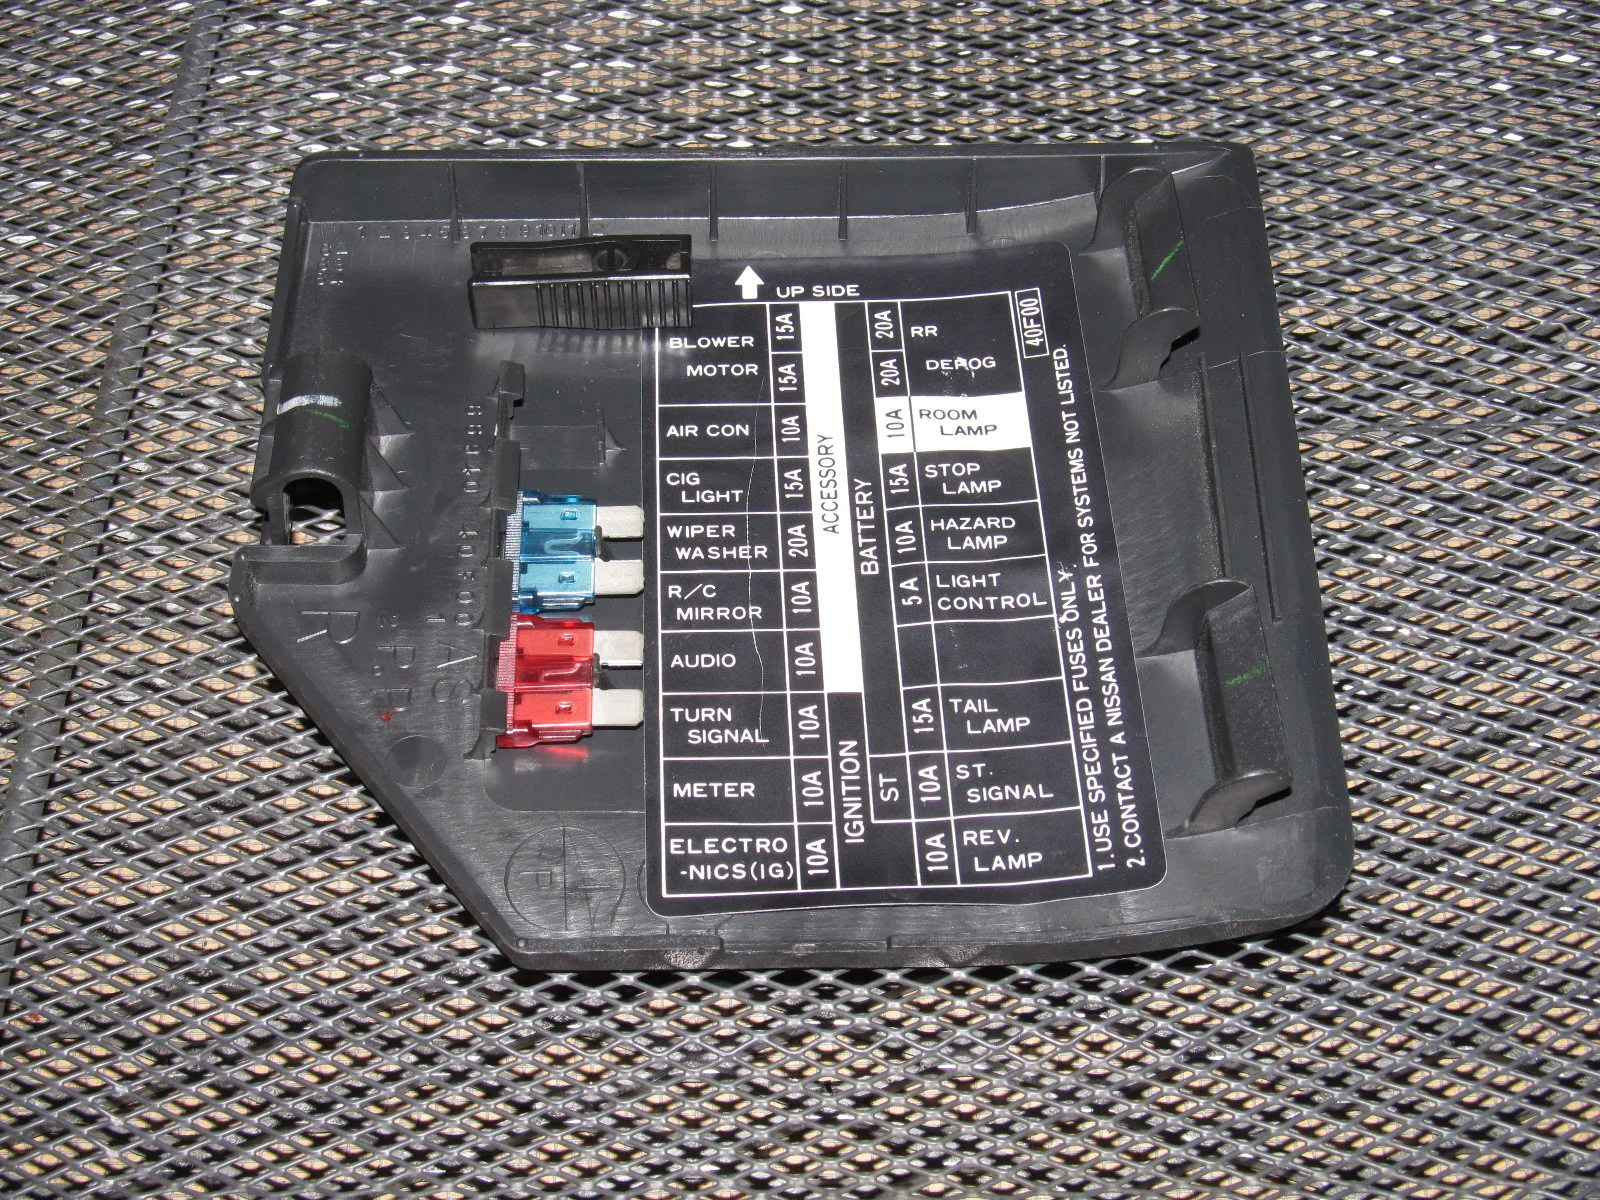 hight resolution of 95 240sx fuse box wiring diagrams schema m2 fuse box 95 s14 fuse box